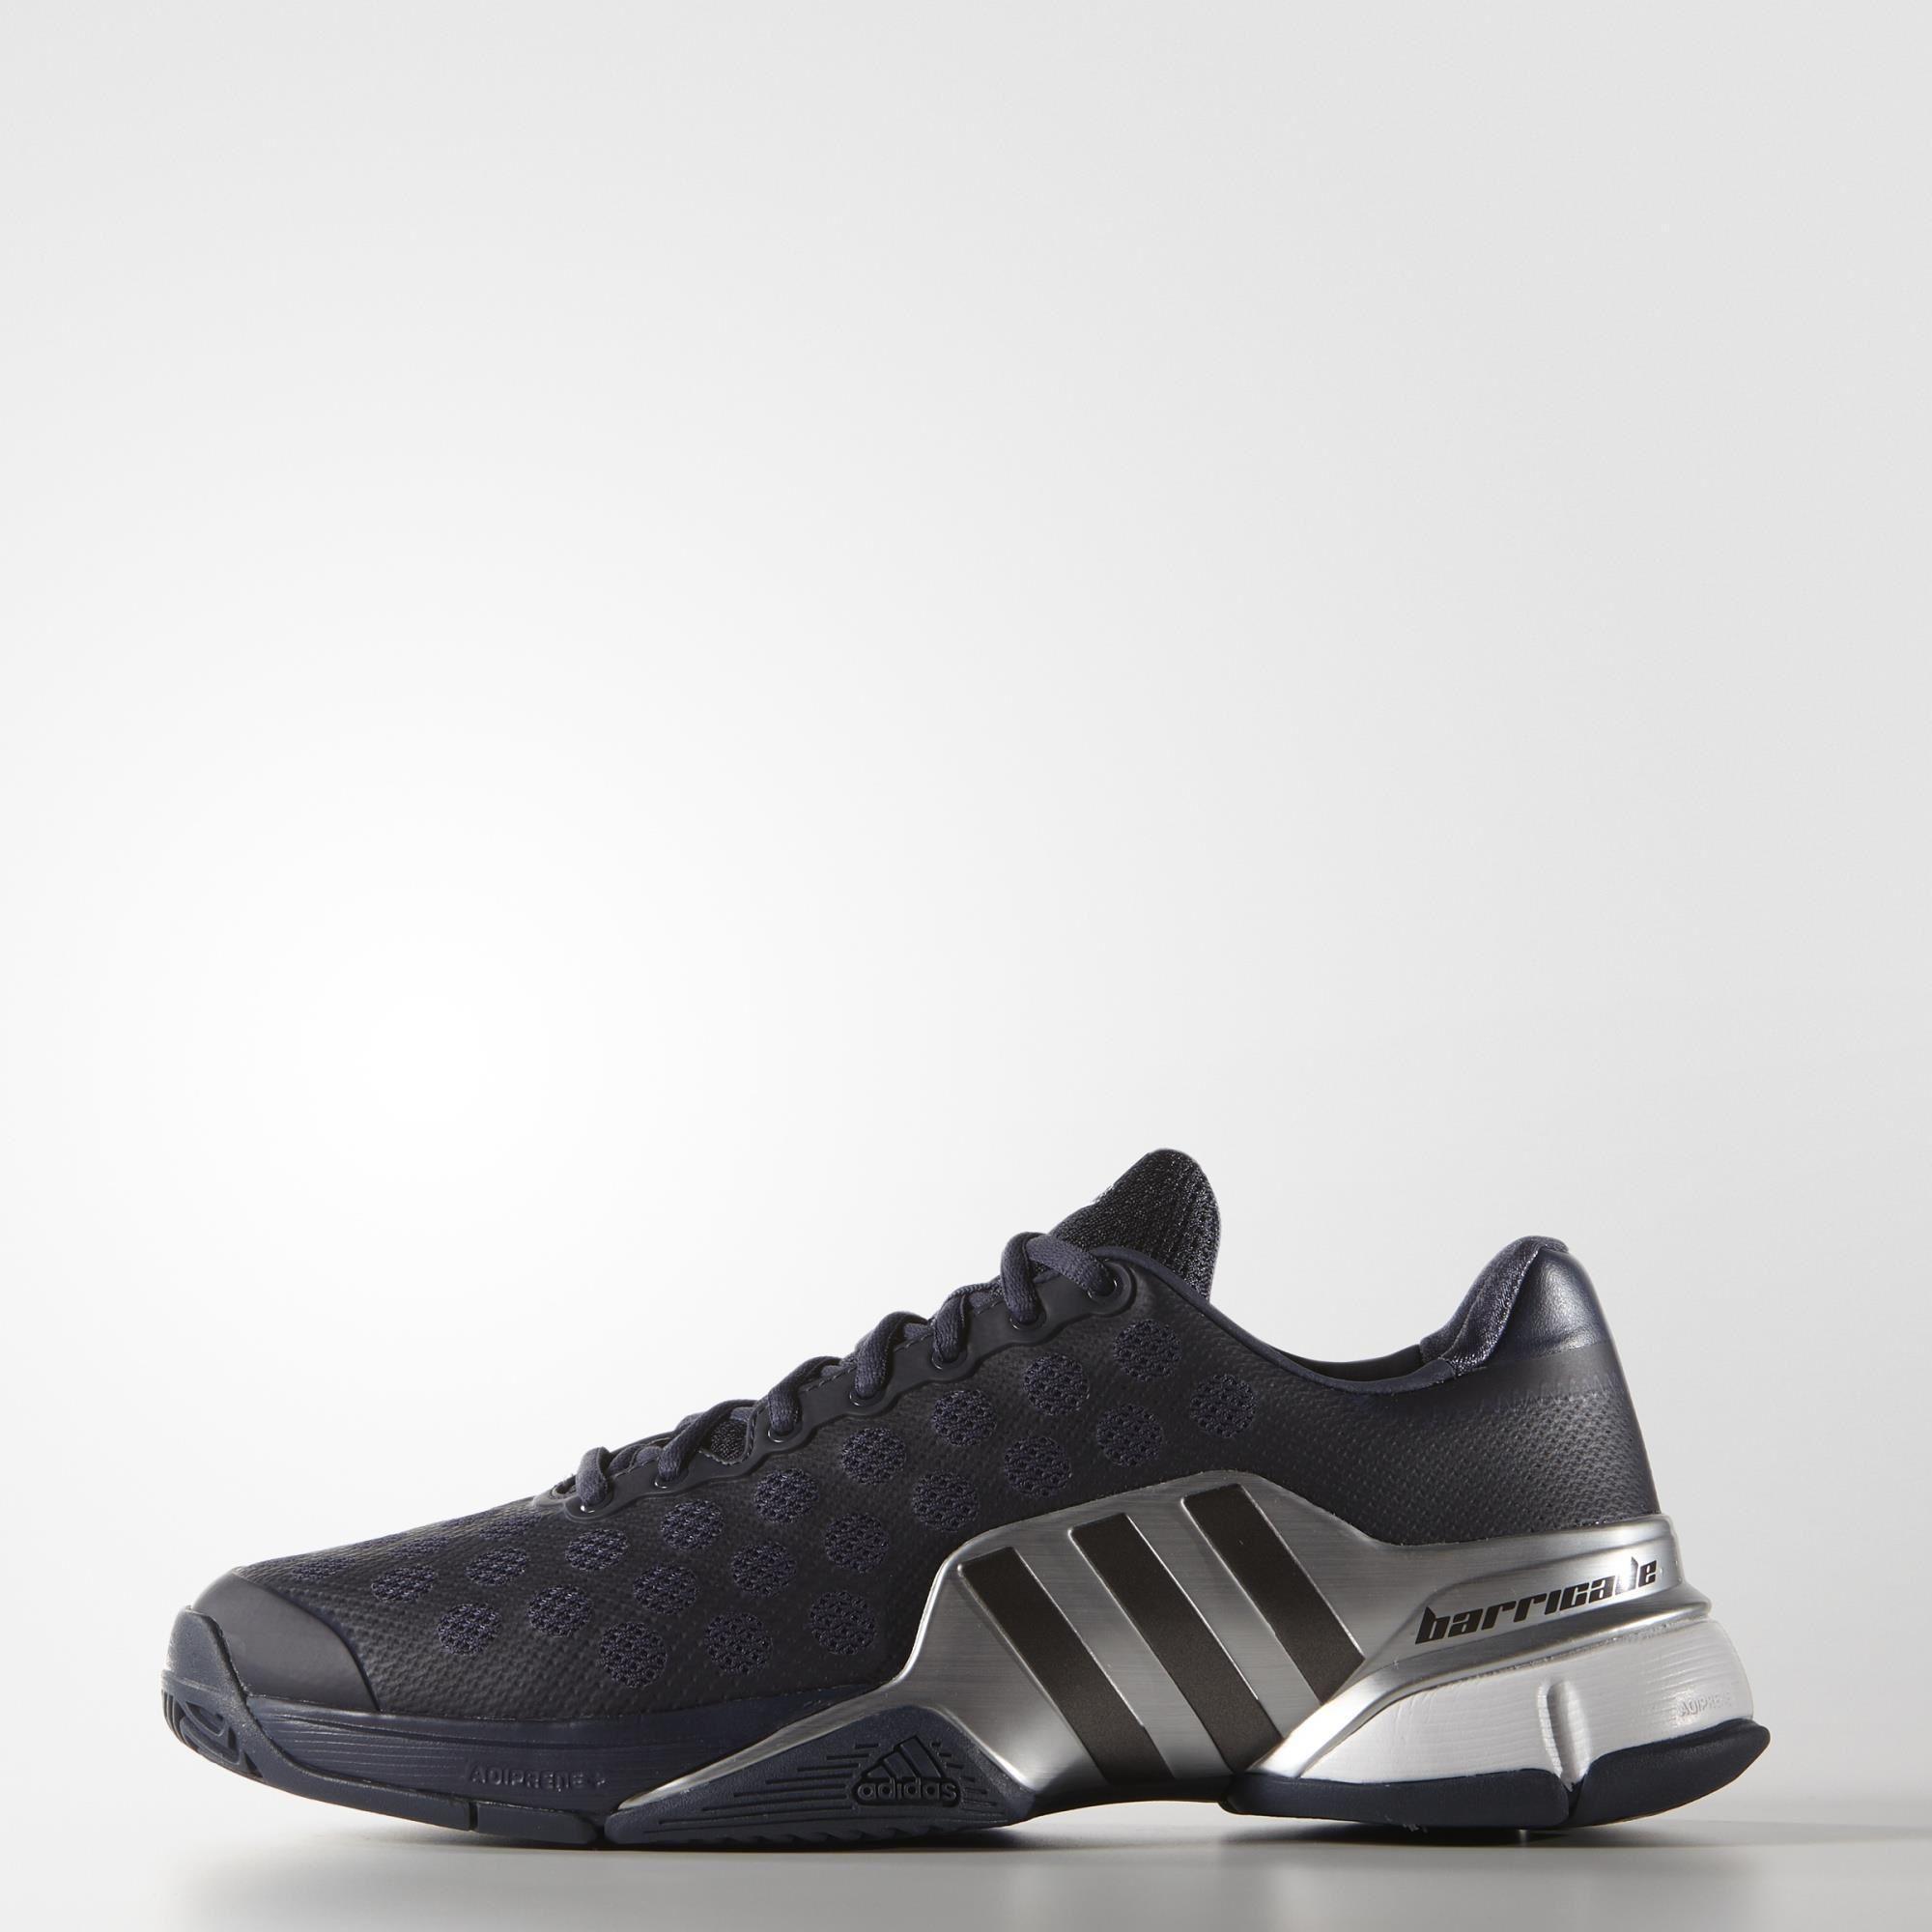 1d5ec9a42e6 Adidas Mens Barricade 2015 Tennis Shoes - Midnight Grey - Tennisnuts.com